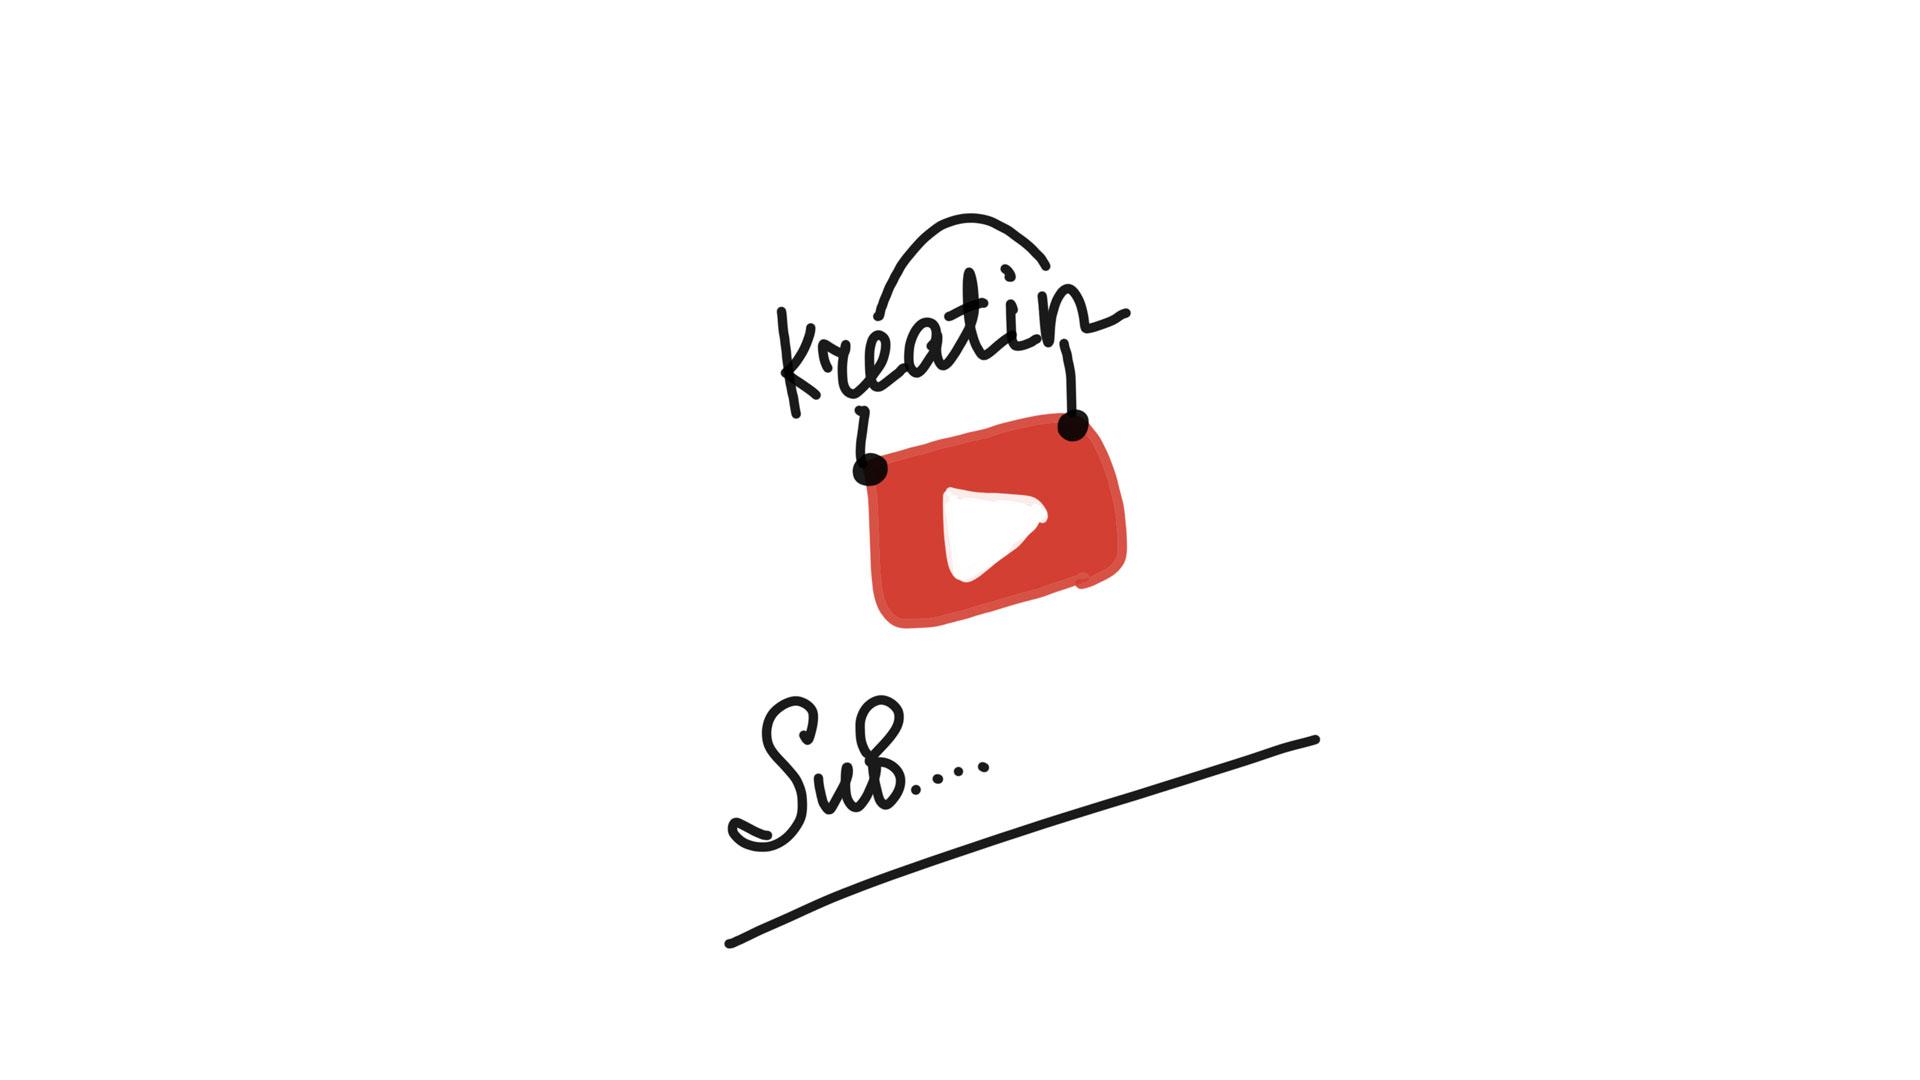 kreatin-sub